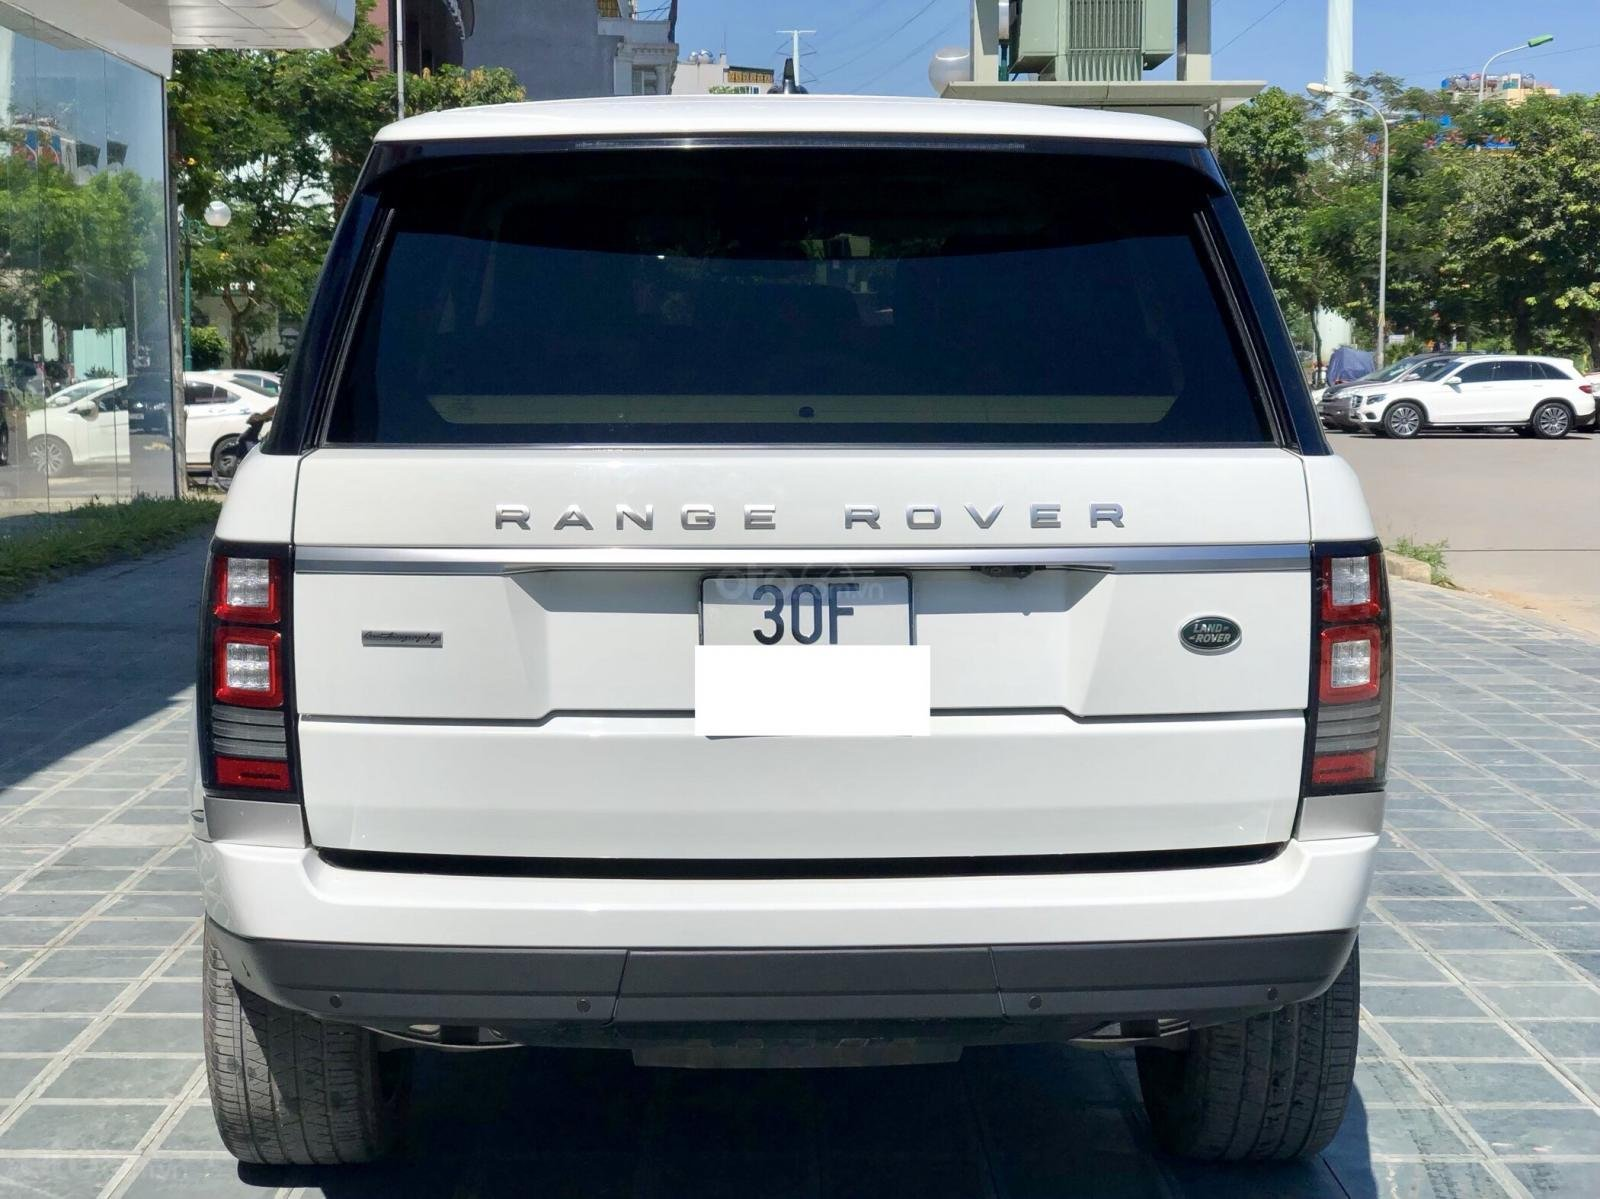 Bán Range Rover HSE 3.0 SX 2016 - Hotline 0945.39.2468 Ms Hương (7)